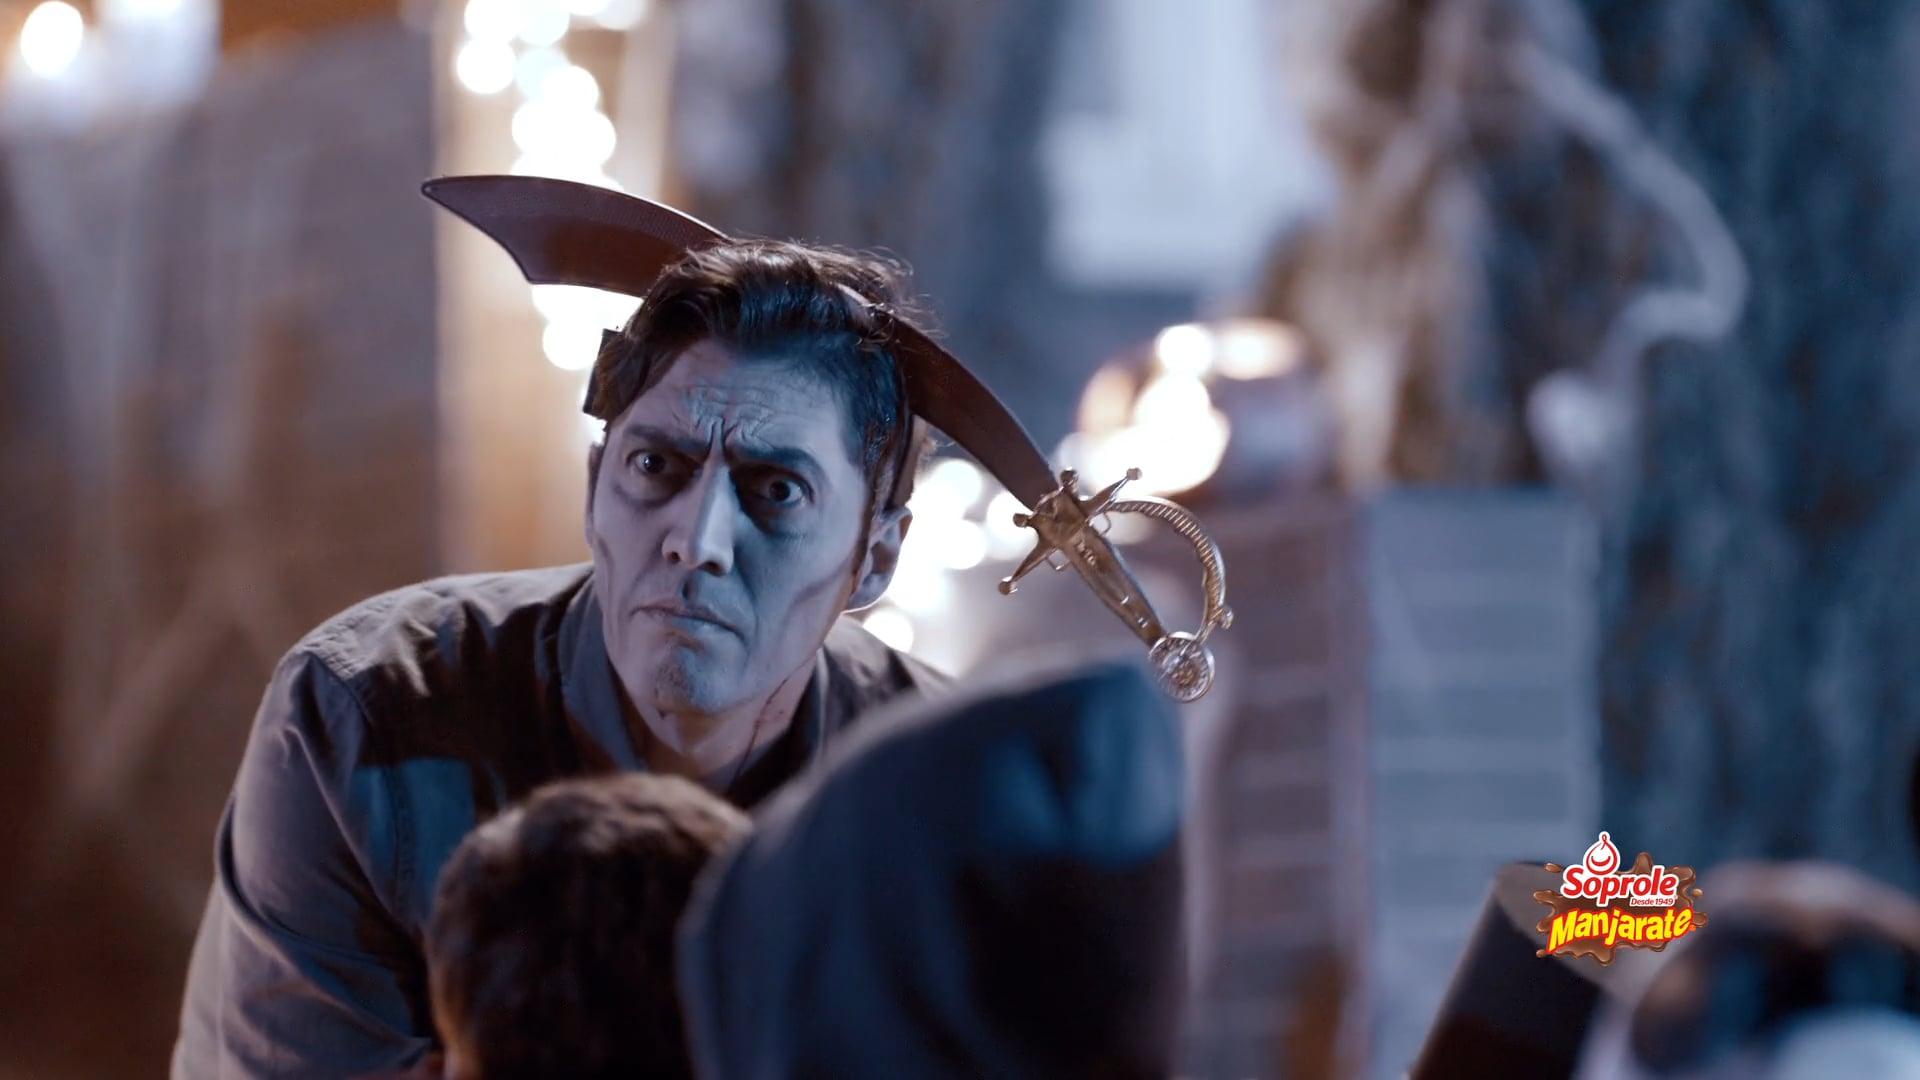 Manjarate Halloween